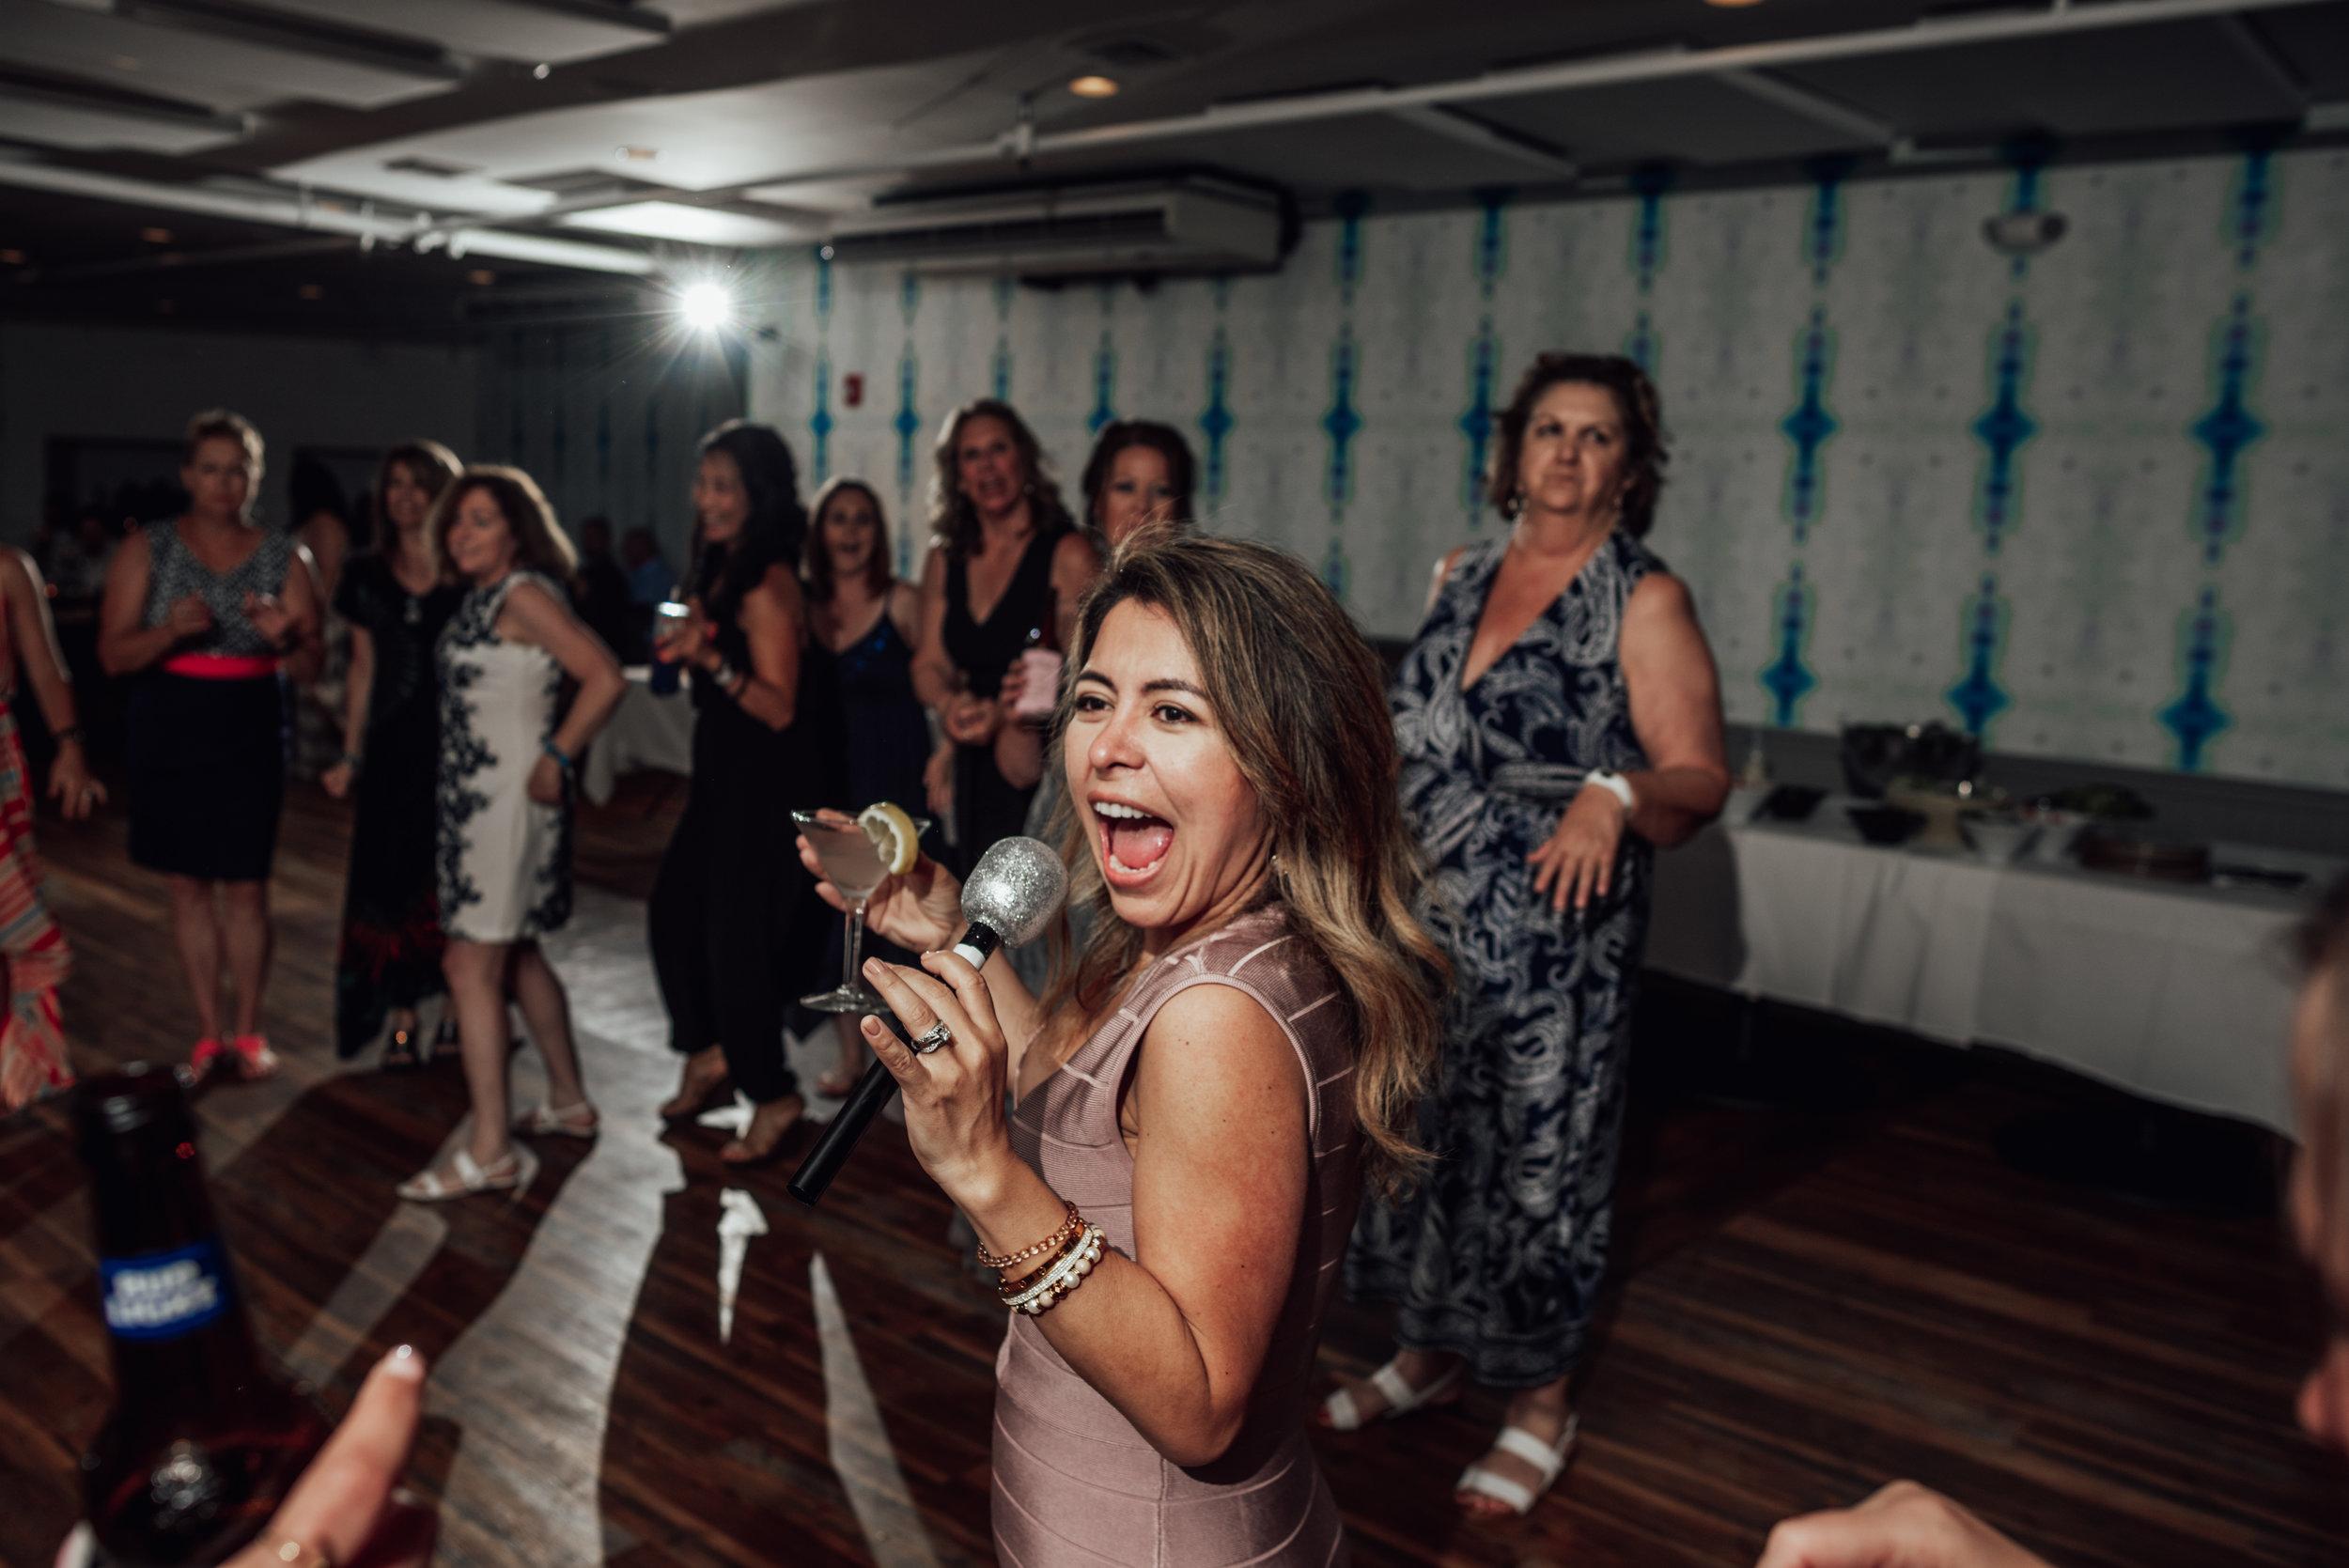 New Jersey Wedding Photographer, Felsberg Photography LBI wedding photography 111.jpg